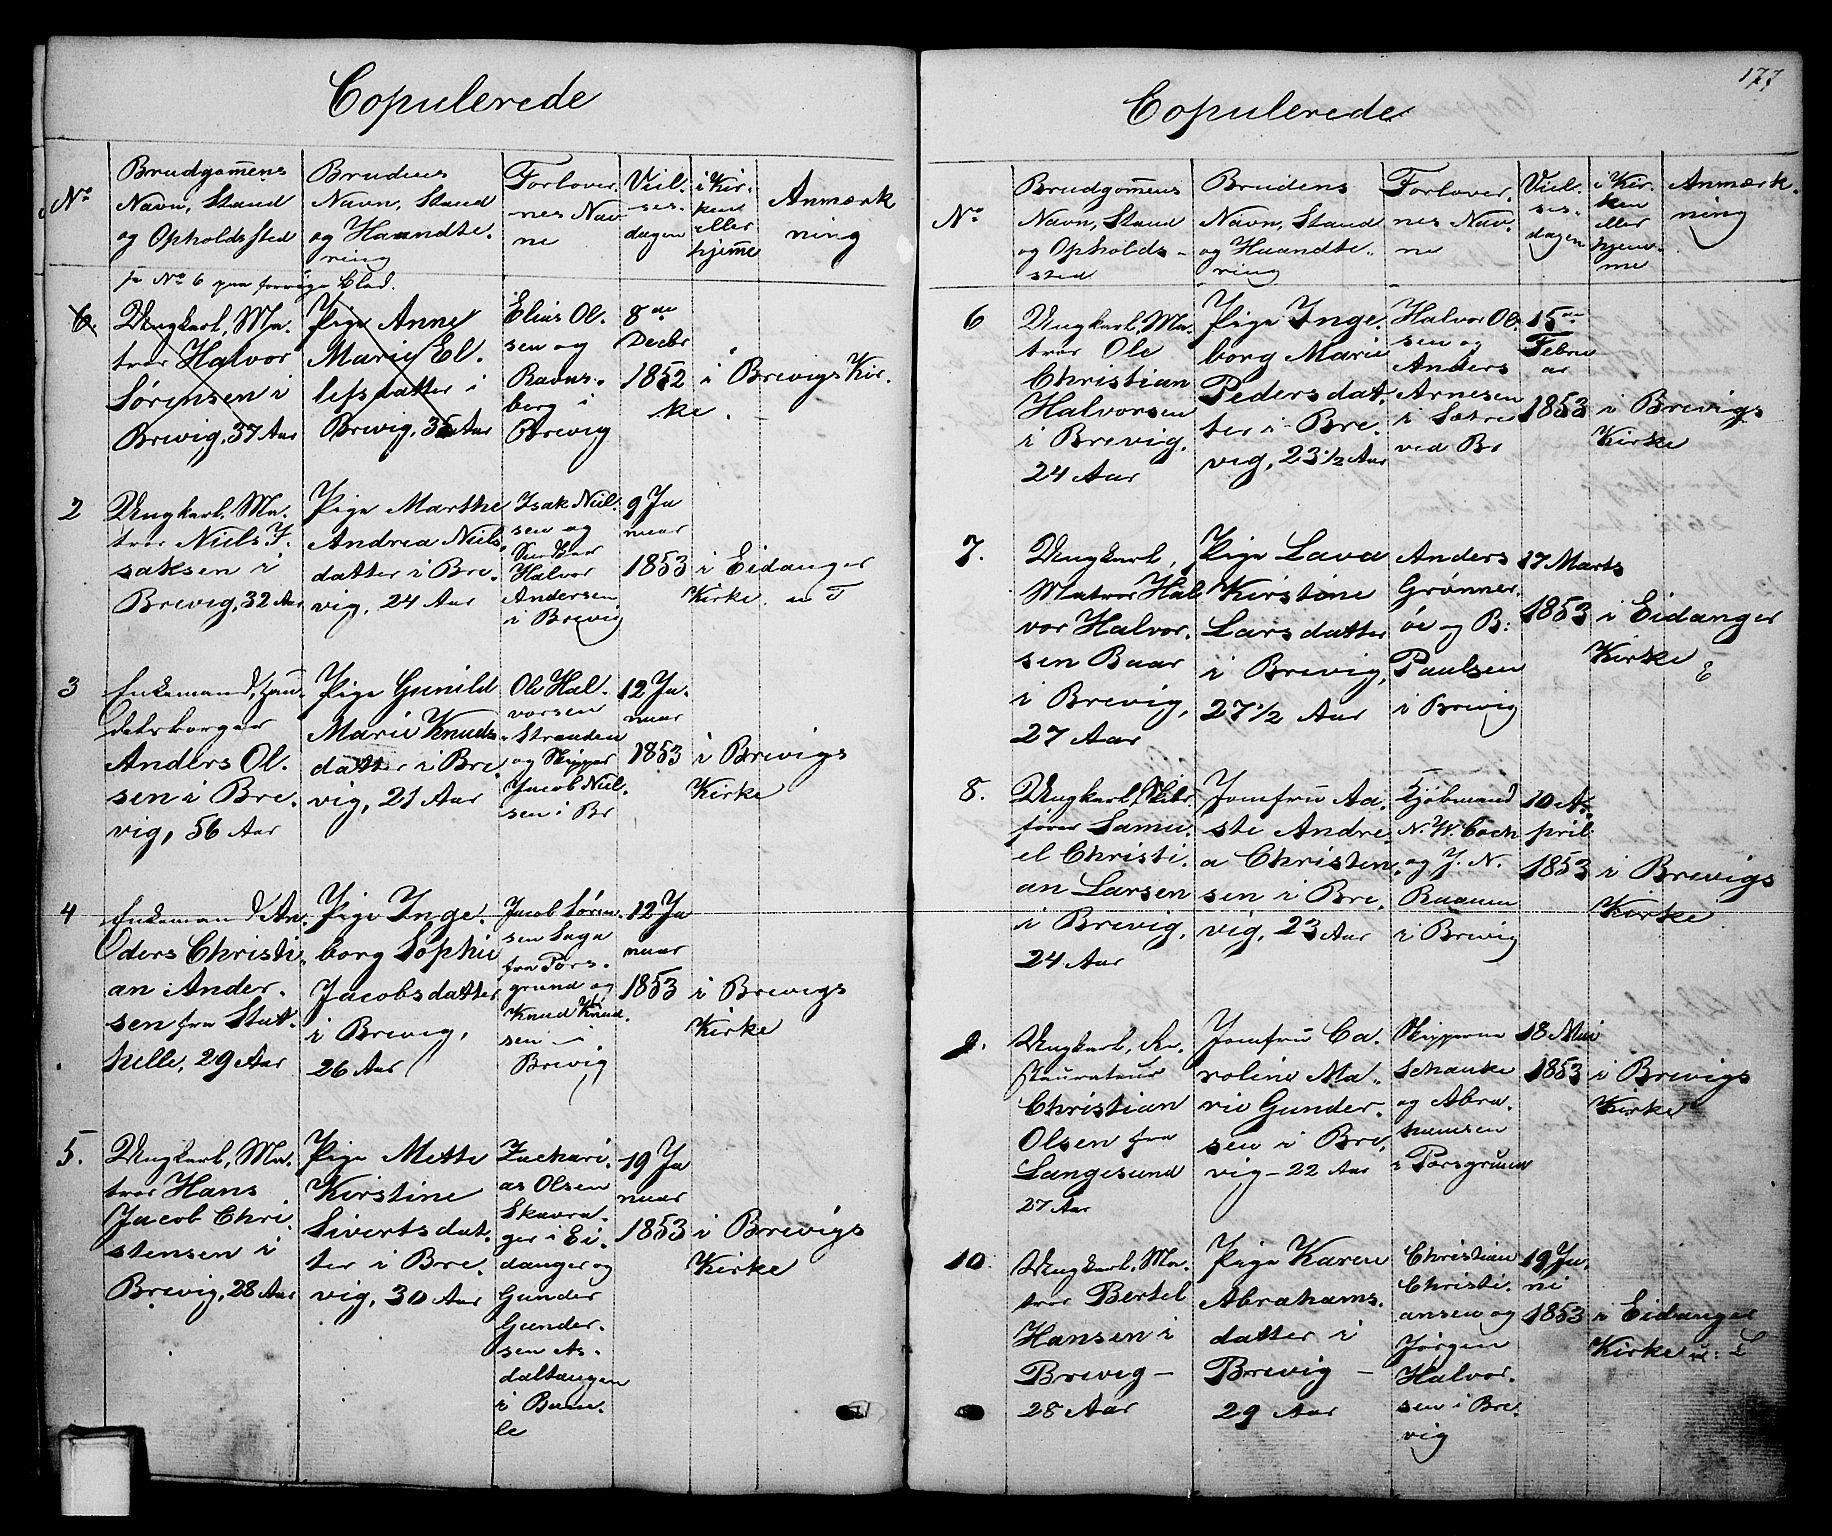 SAKO, Brevik kirkebøker, G/Ga/L0002: Klokkerbok nr. 2, 1846-1865, s. 177